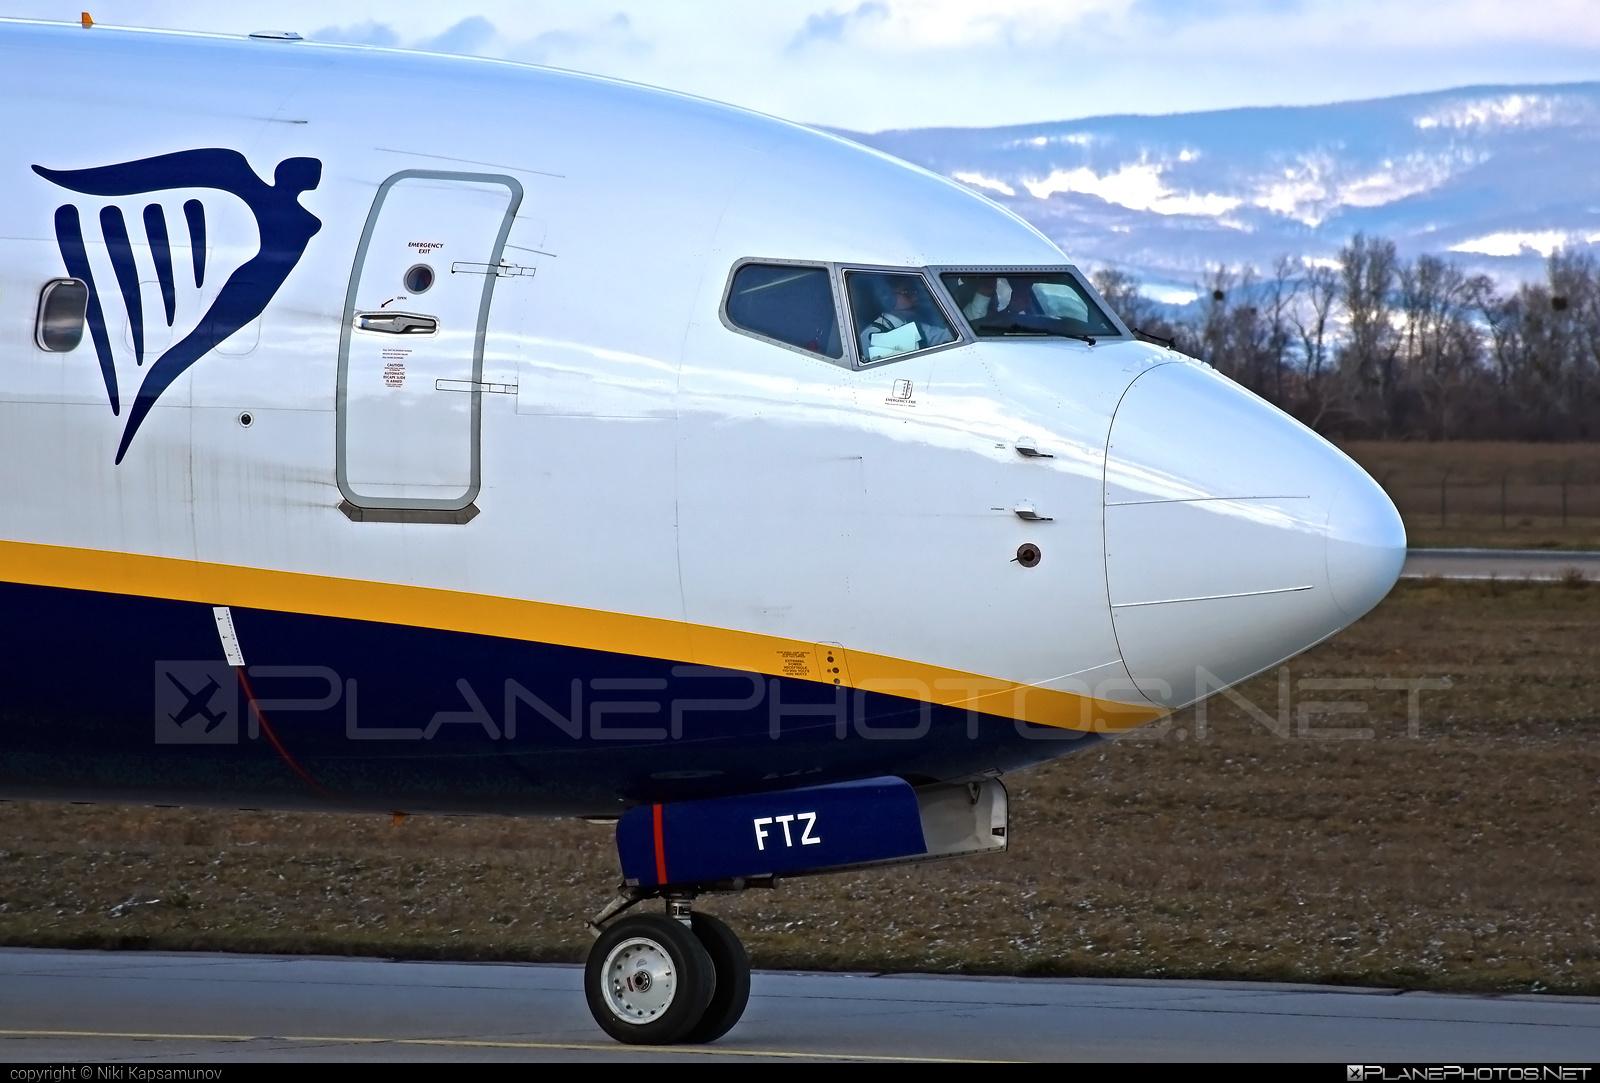 Ryanair Boeing 737-800 - EI-FTZ #b737 #b737nextgen #b737ng #boeing #boeing737 #ryanair